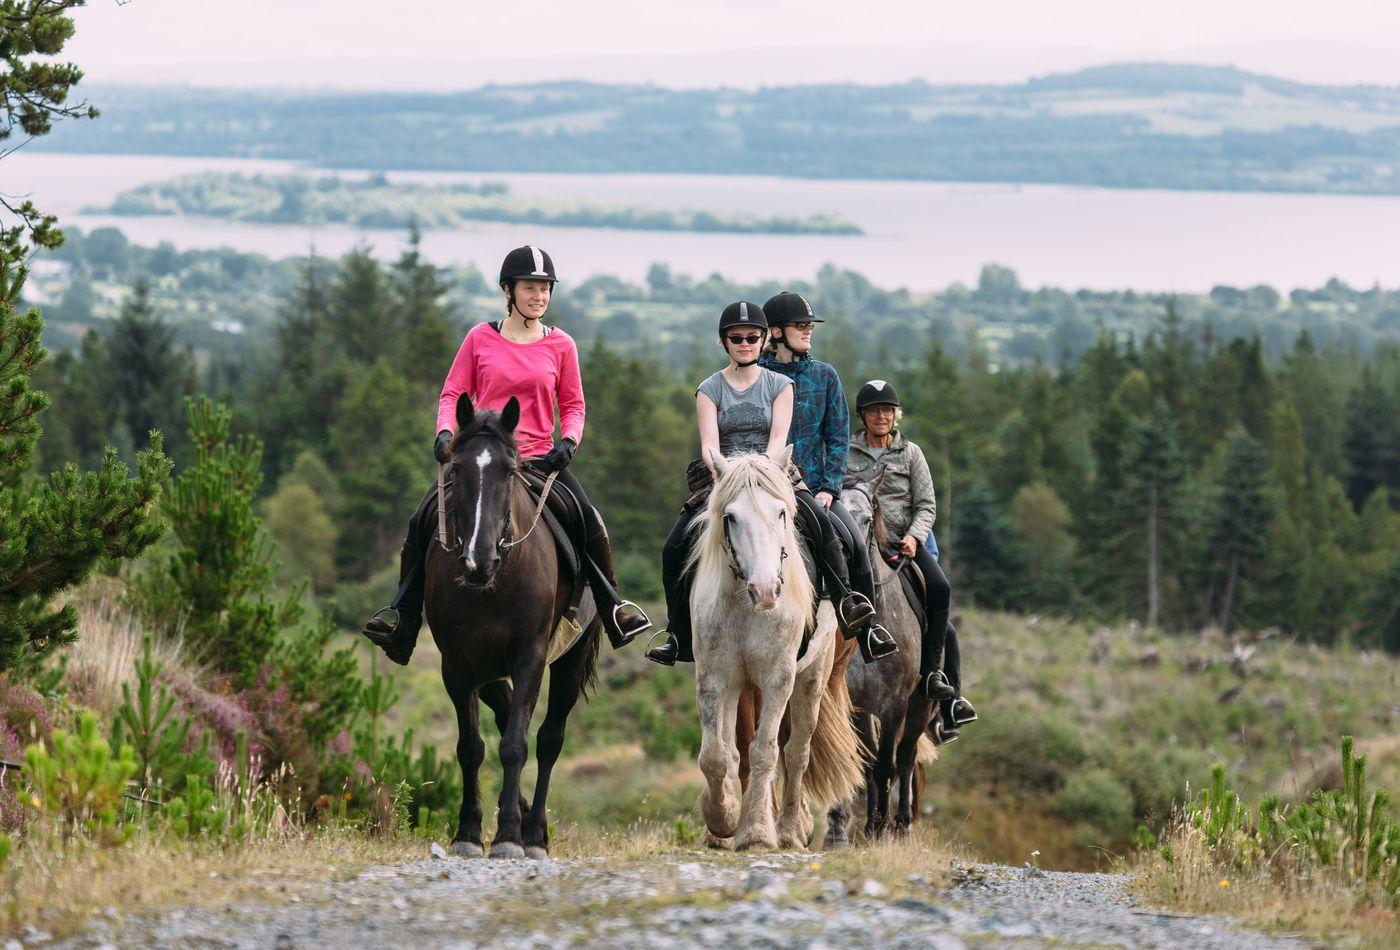 Irish Castle and Monastic Ruin Ride itinerary.